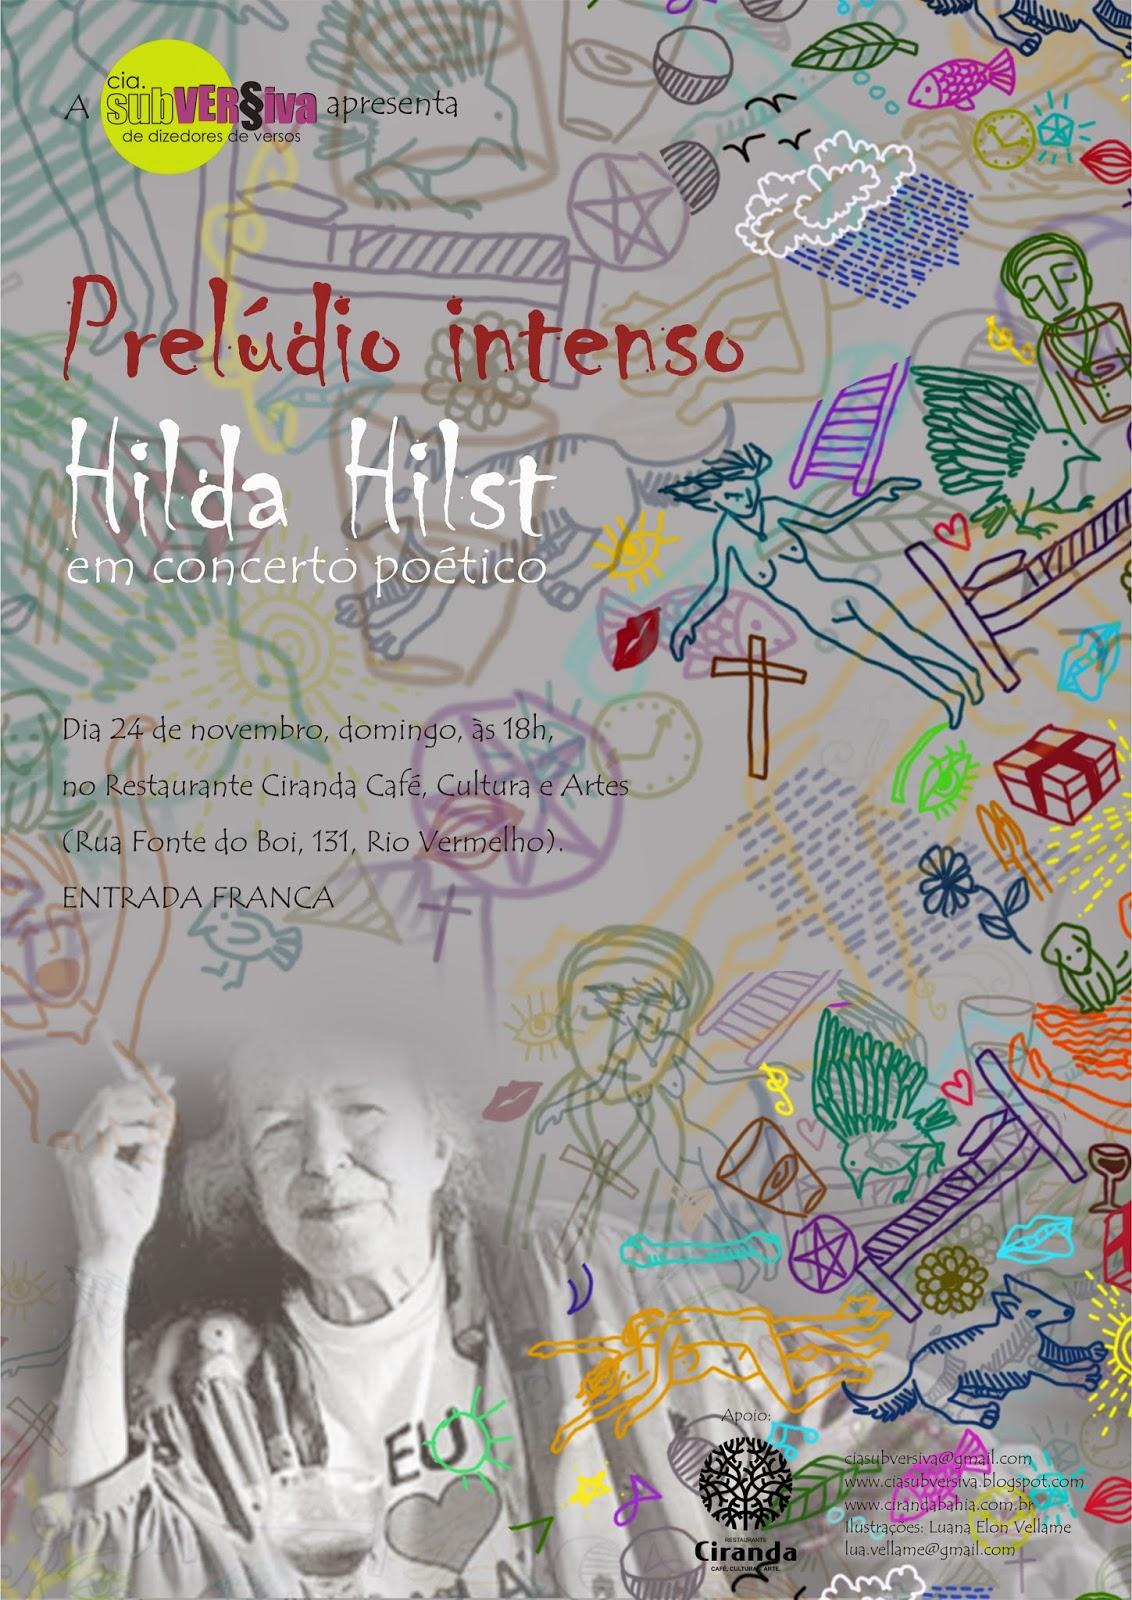 http://1.bp.blogspot.com/-WR7xIiBPaus/UoludC5CaLI/AAAAAAAAAWc/Amojc_zjvzE/s1600/HILDA_Ciranda.jpg